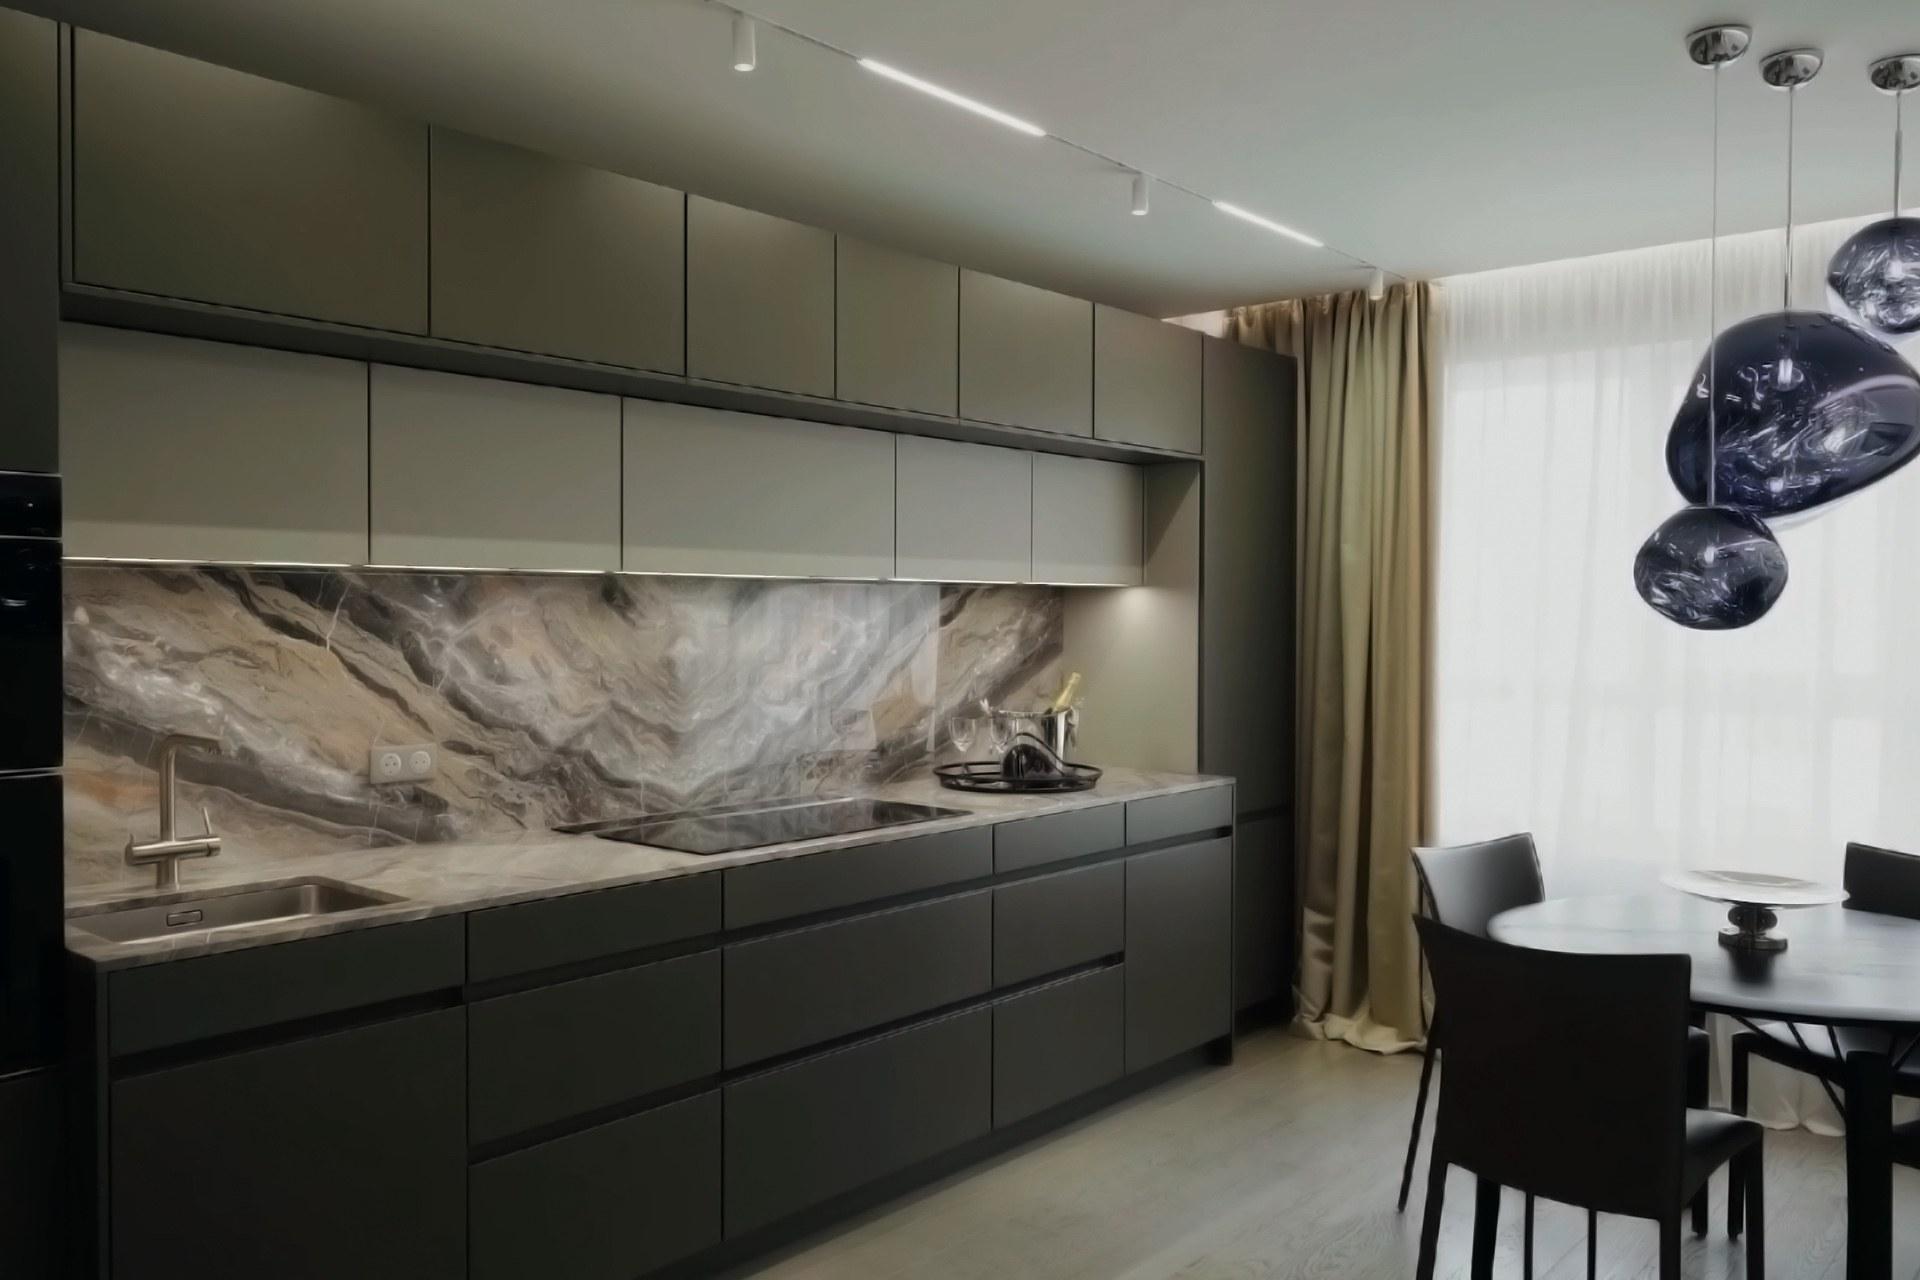 Кухня студия - тренд 2021